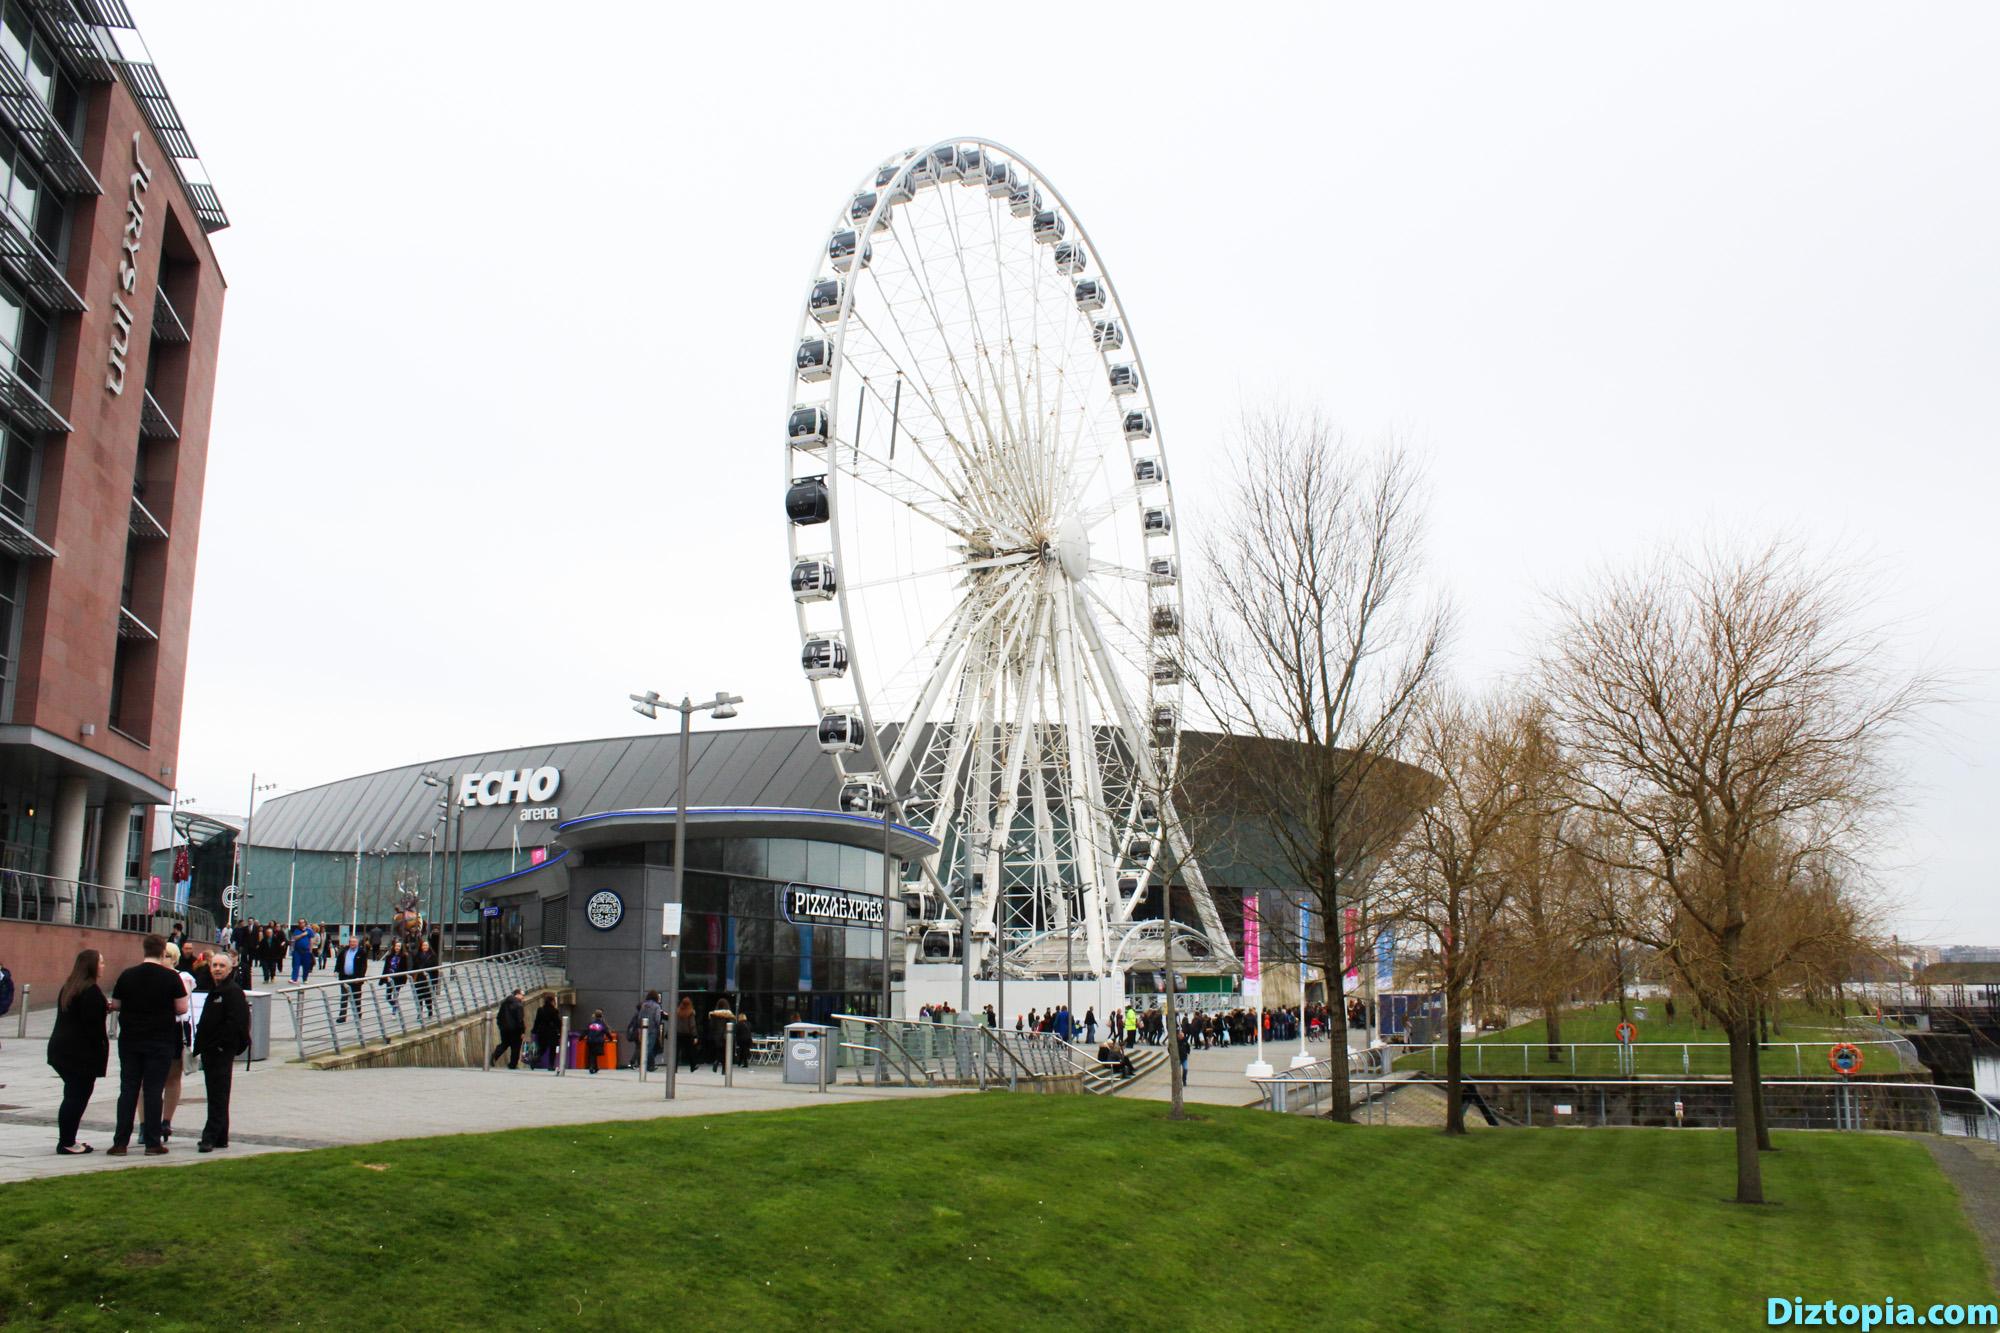 Liverpool-City-UK-Diztopia-Dizma-Dahl-Photography-2017-24-Albert-Dock-Queens-Wapping-Salthouse-Canning-Coburg-Dukes-Ferris-Wheel